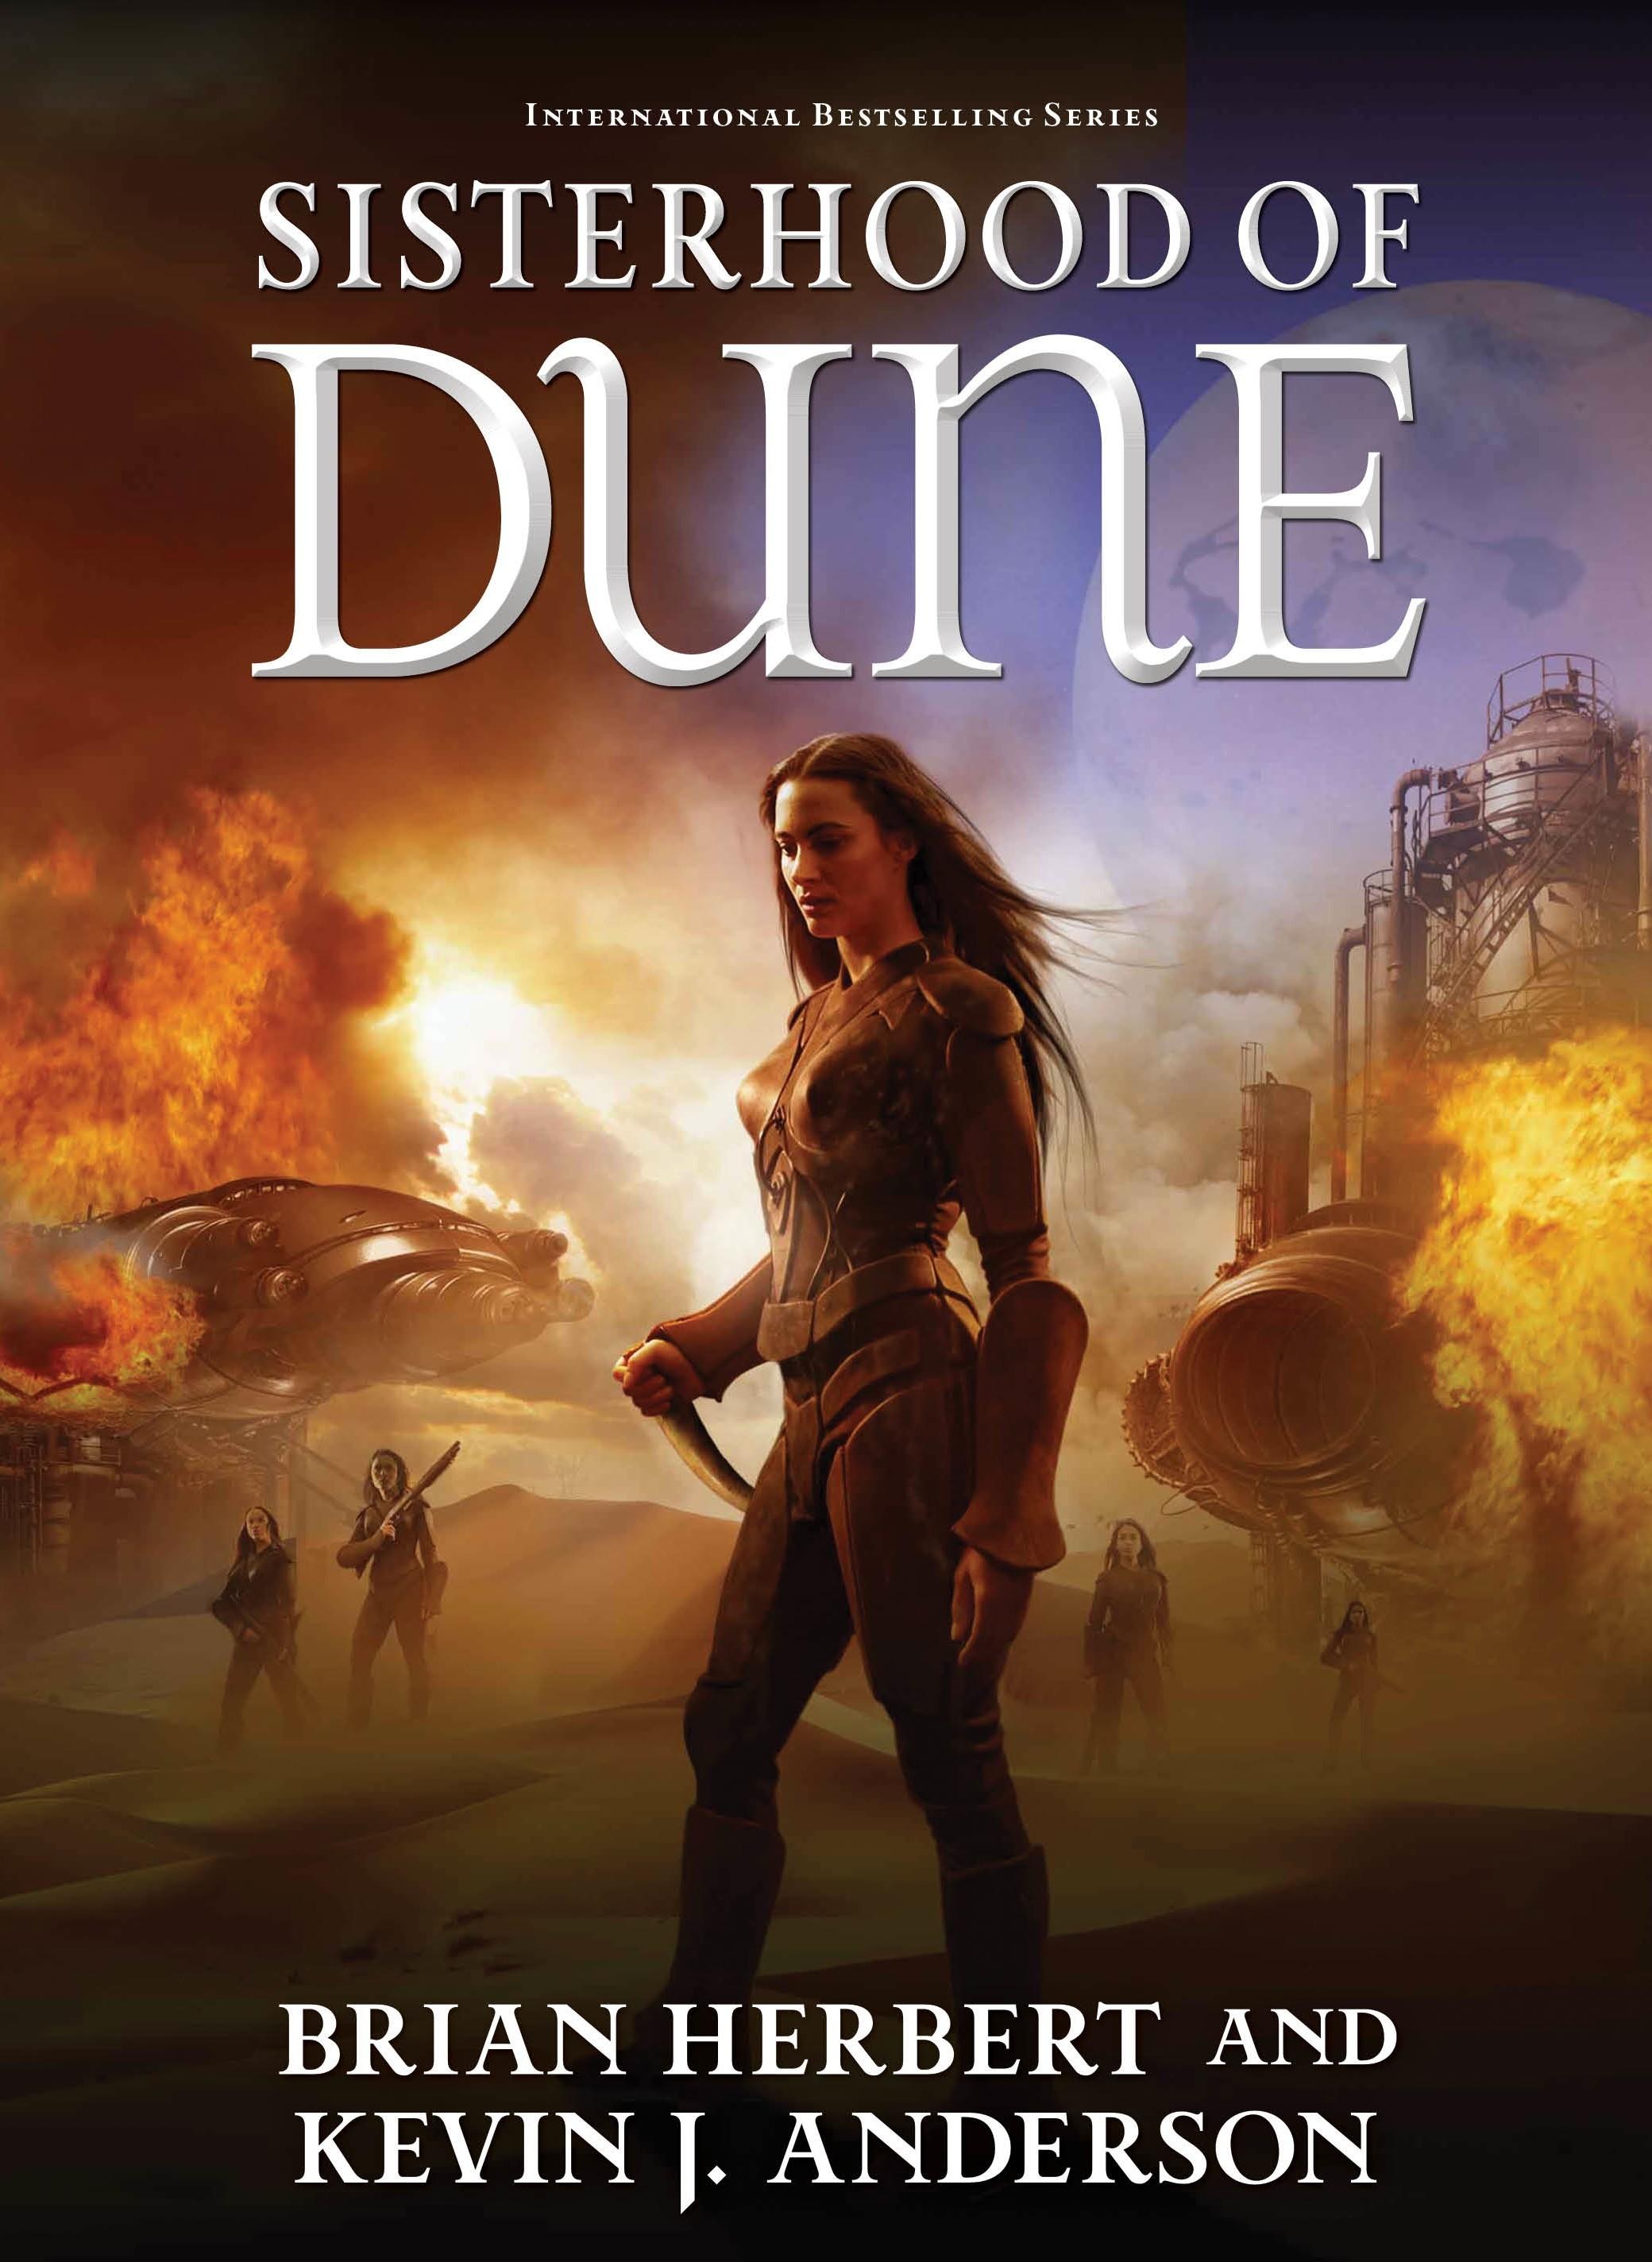 Sisterhood of Dune: A Review (Kinda)